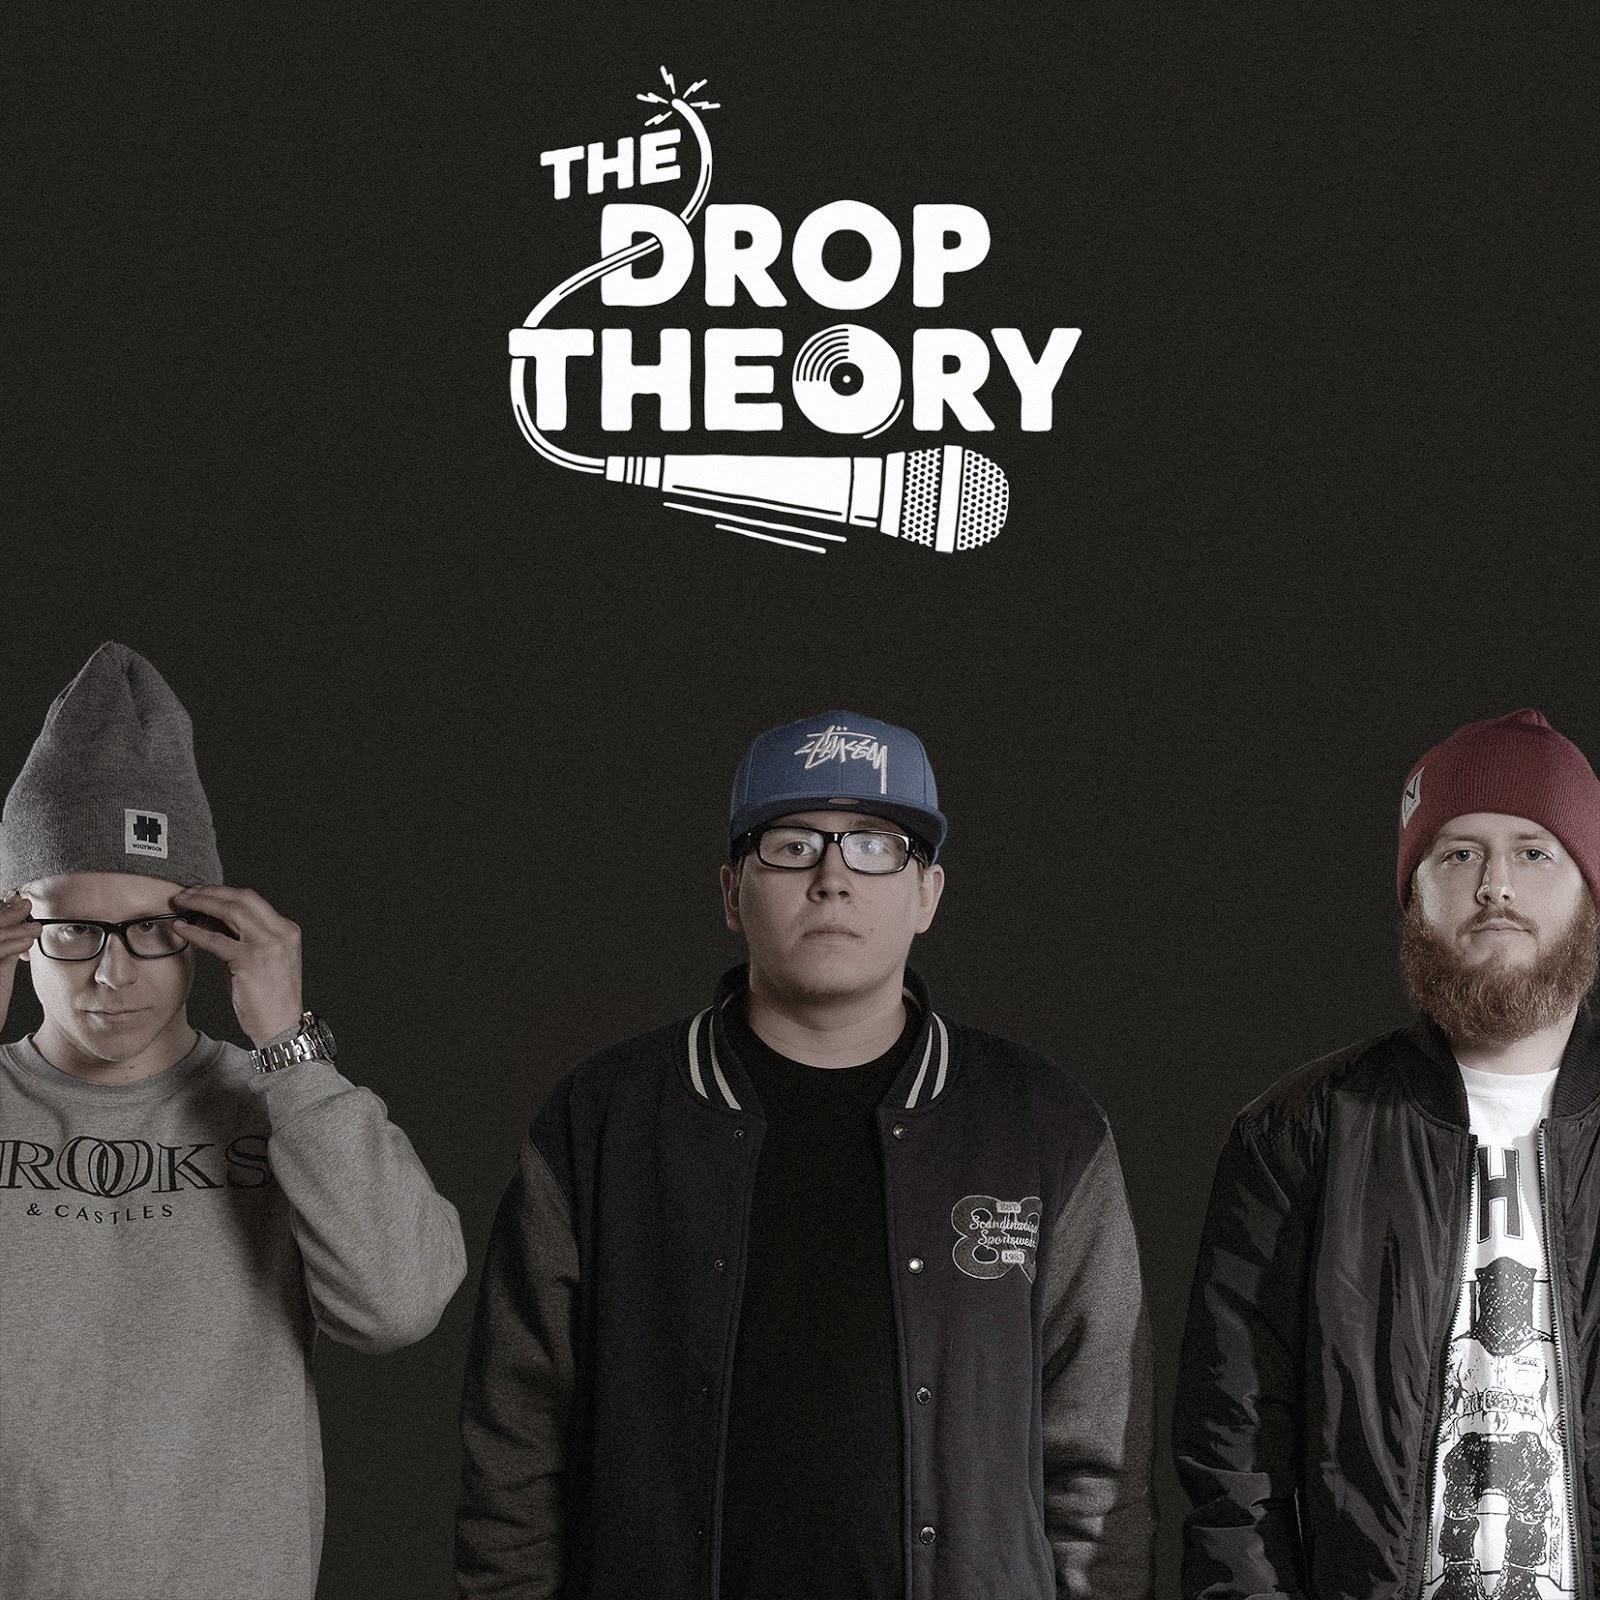 The Drop Theory - The Drop Theory EP (2015) (Suecia)